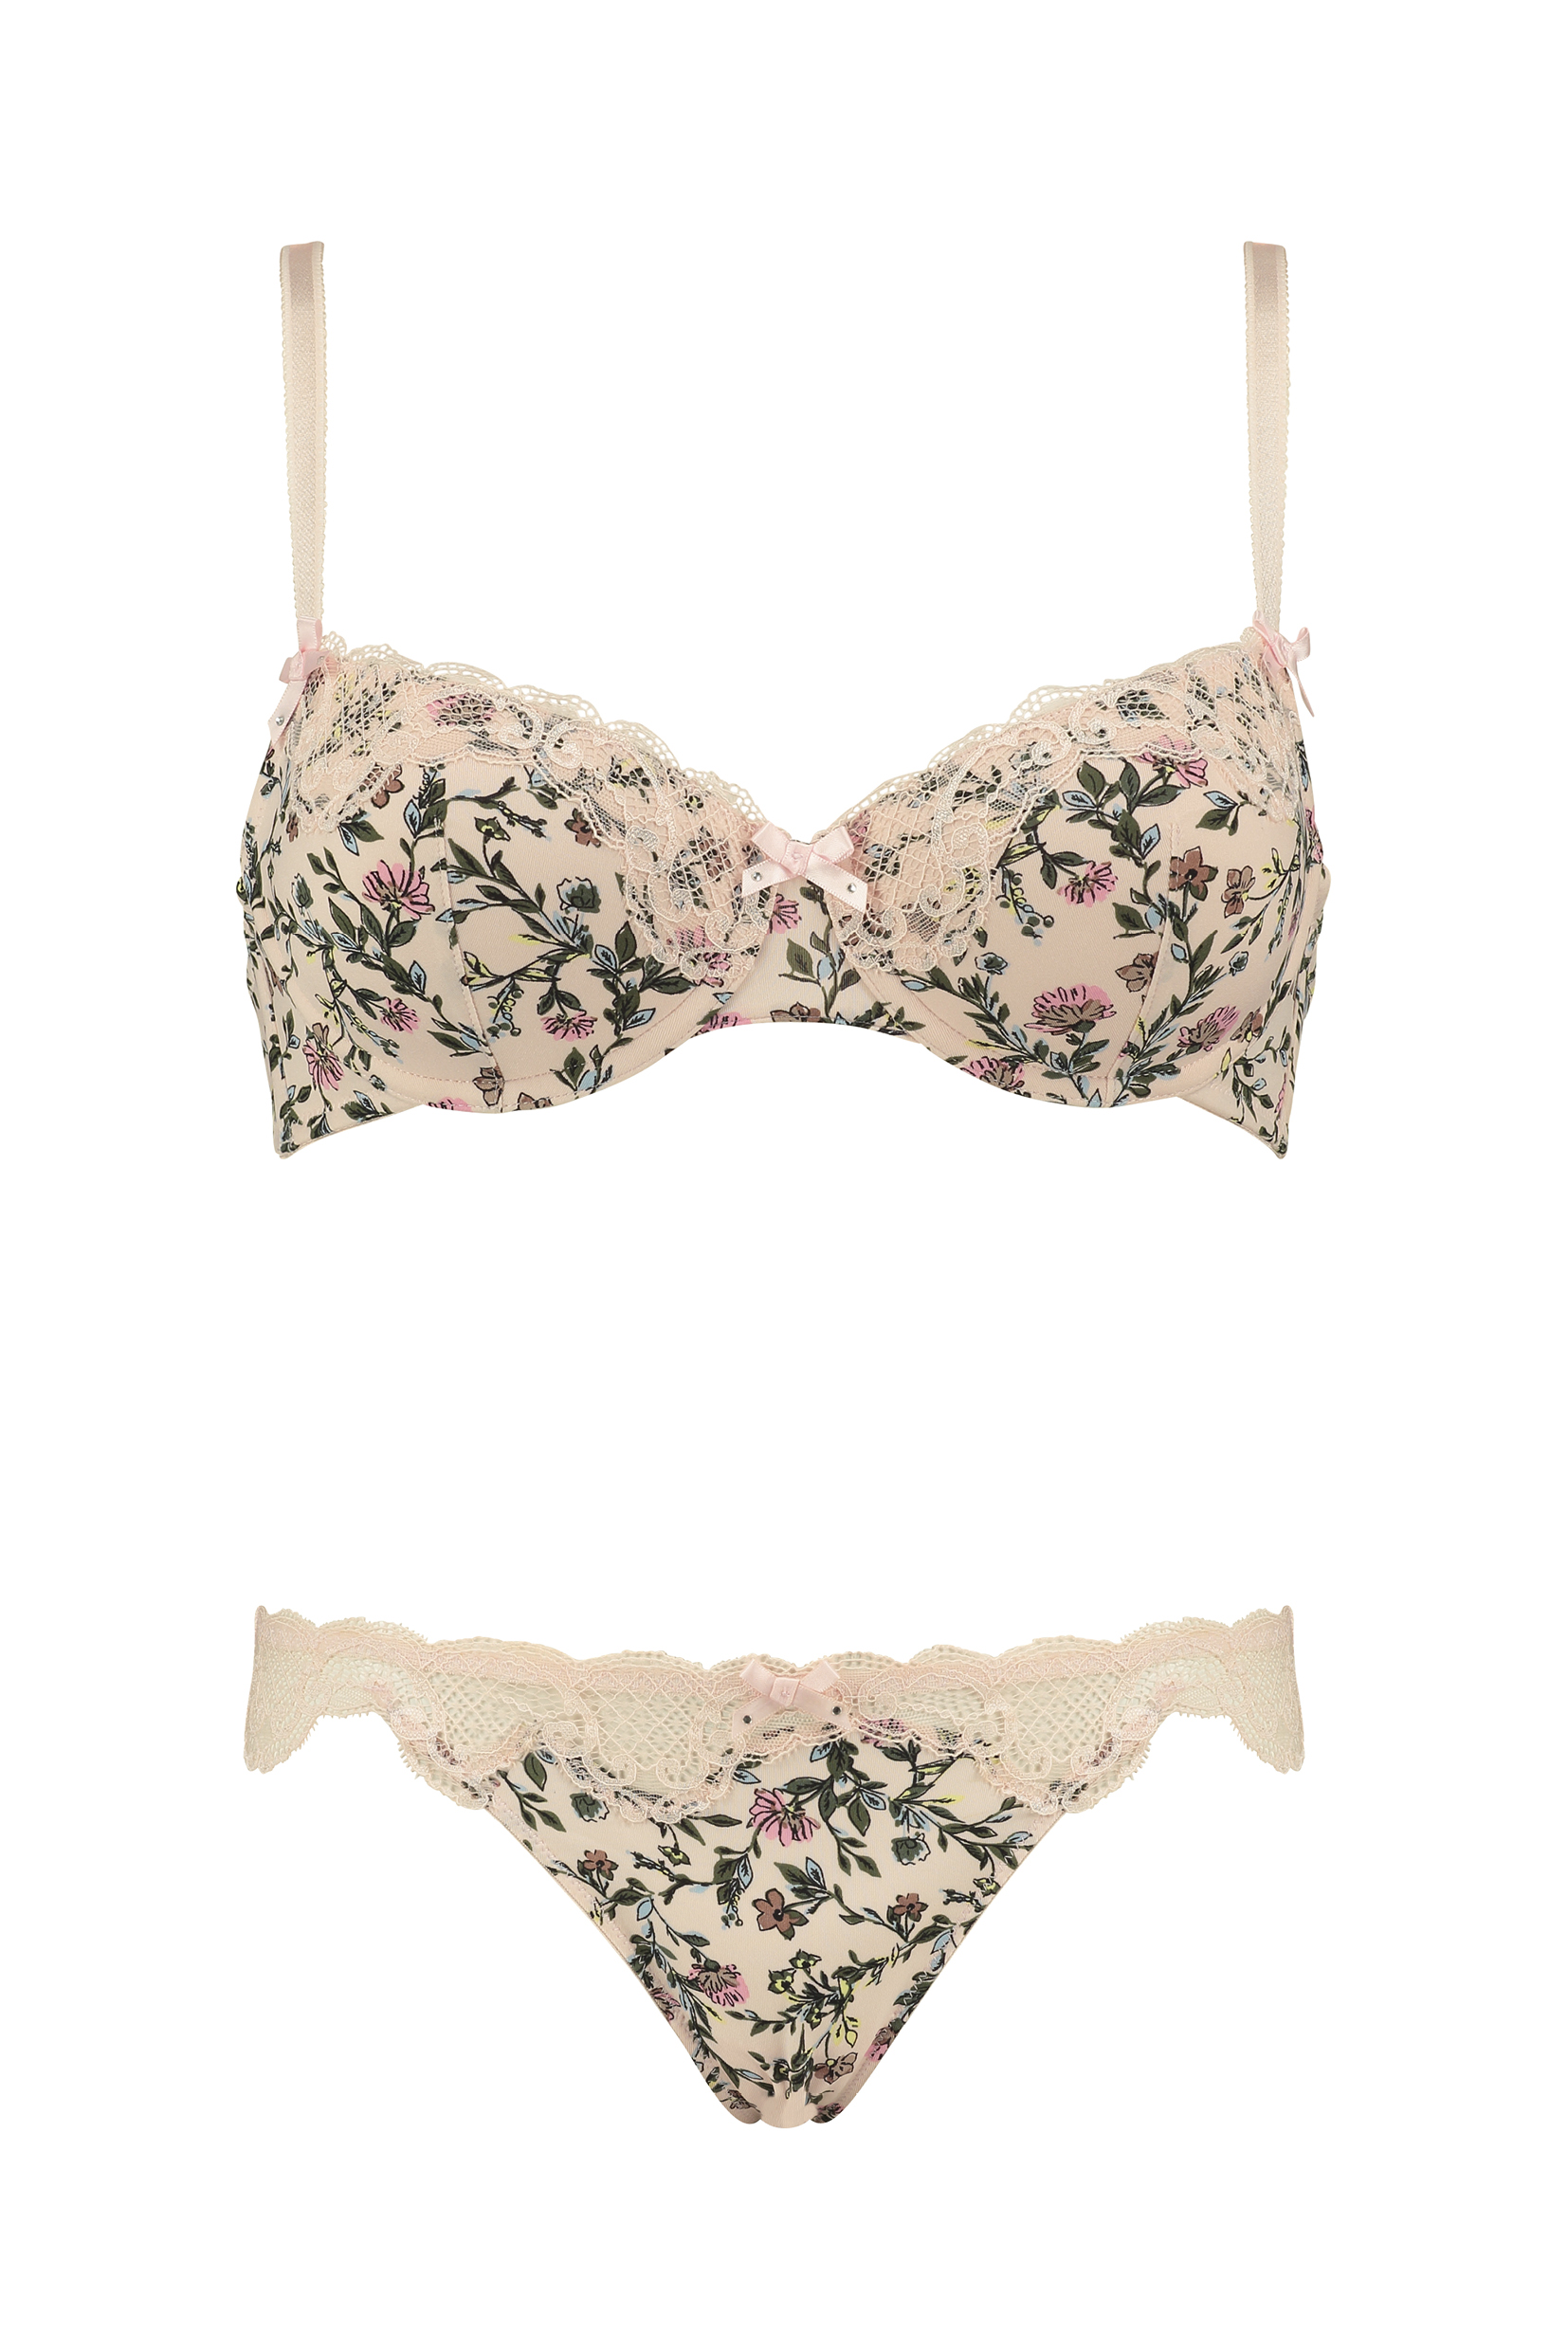 Packshots_roze bloem 292-295